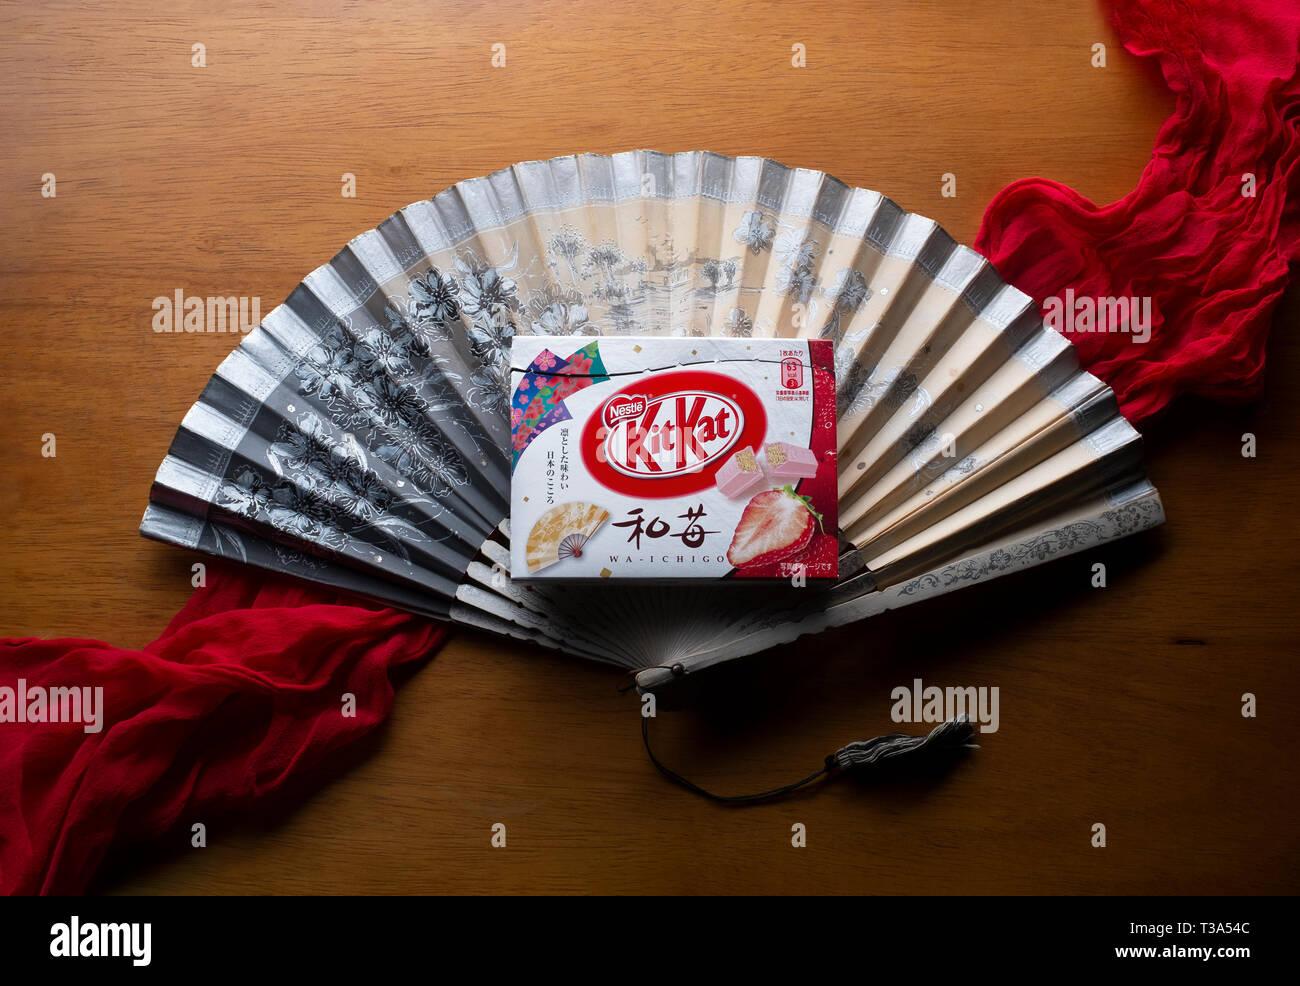 A Japanese 'Waichigo' Strawberry Kit Kat - Stock Image